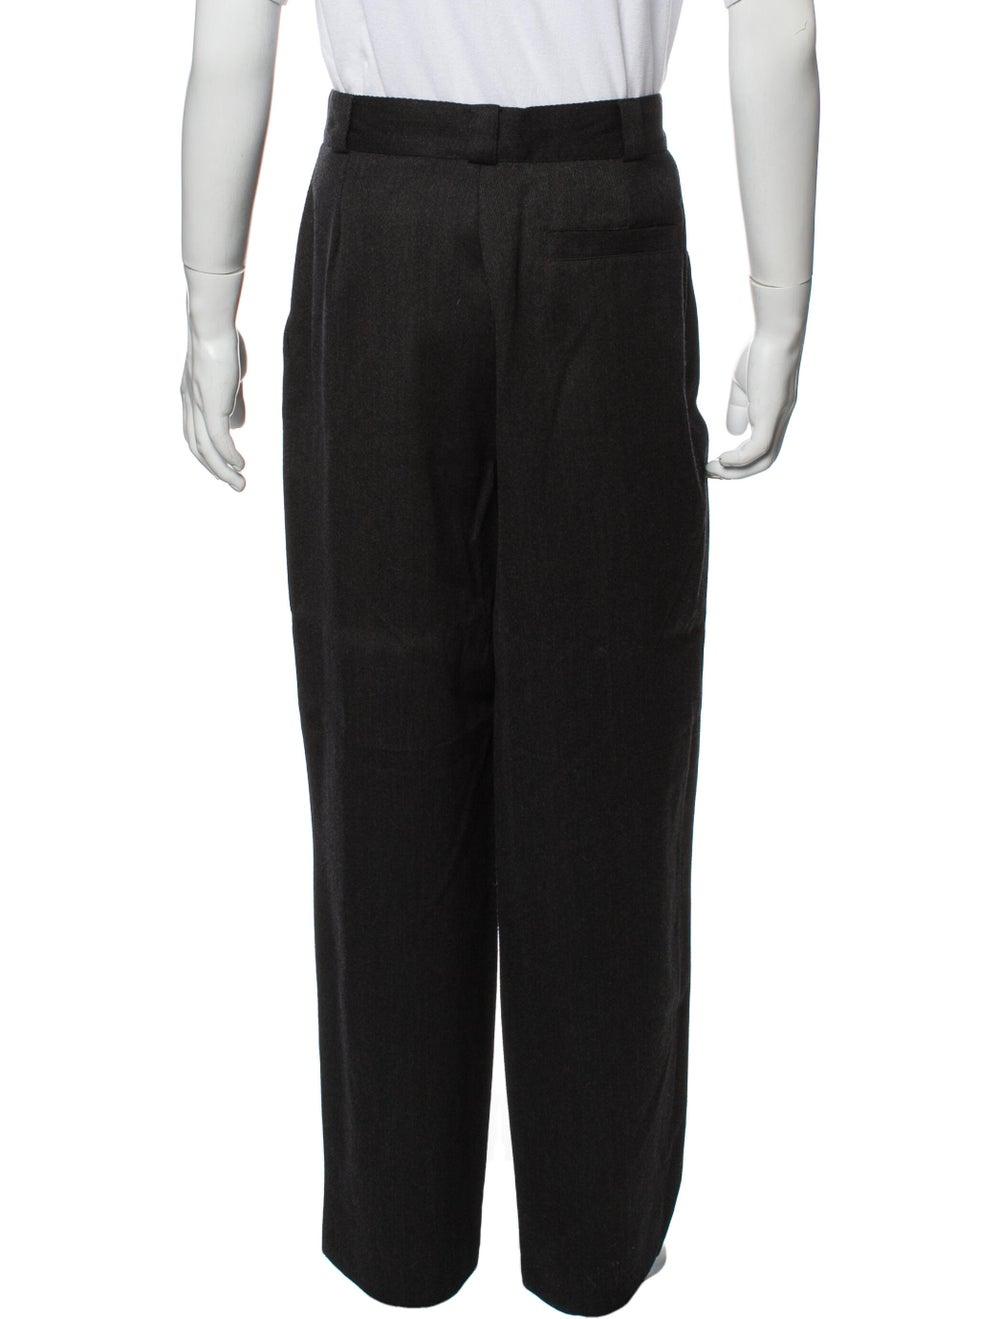 Gianni Versace Vintage Pants Wool - image 3